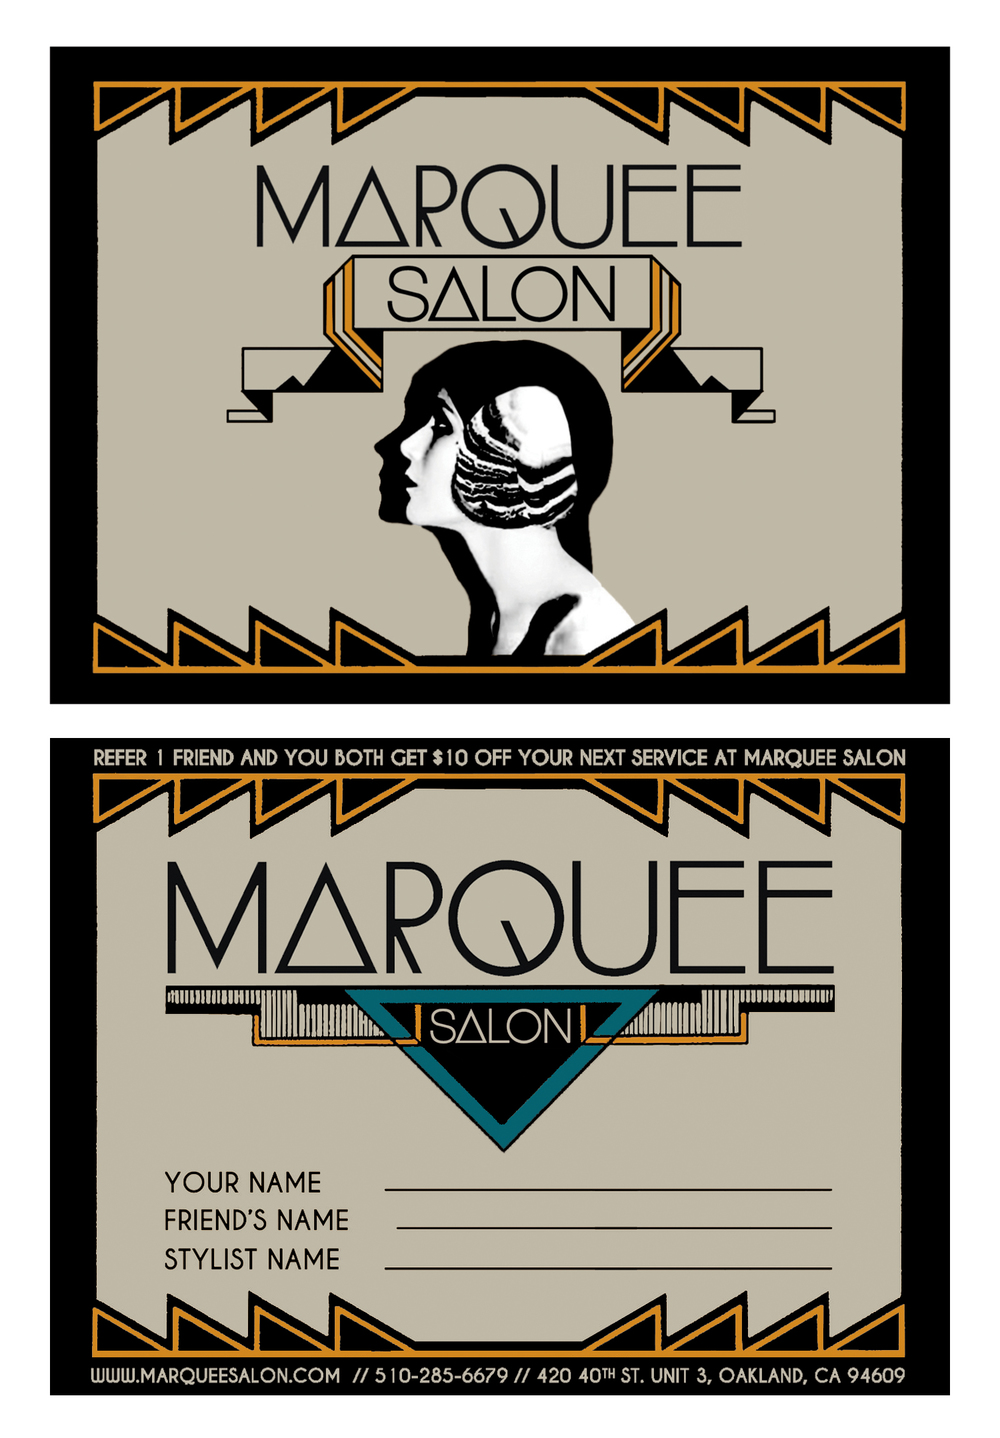 TARCADE DESIGNS FOR MARQUEE SALON / REFERRAL CARD FOR PRINT /©MARQUEE SALON          .